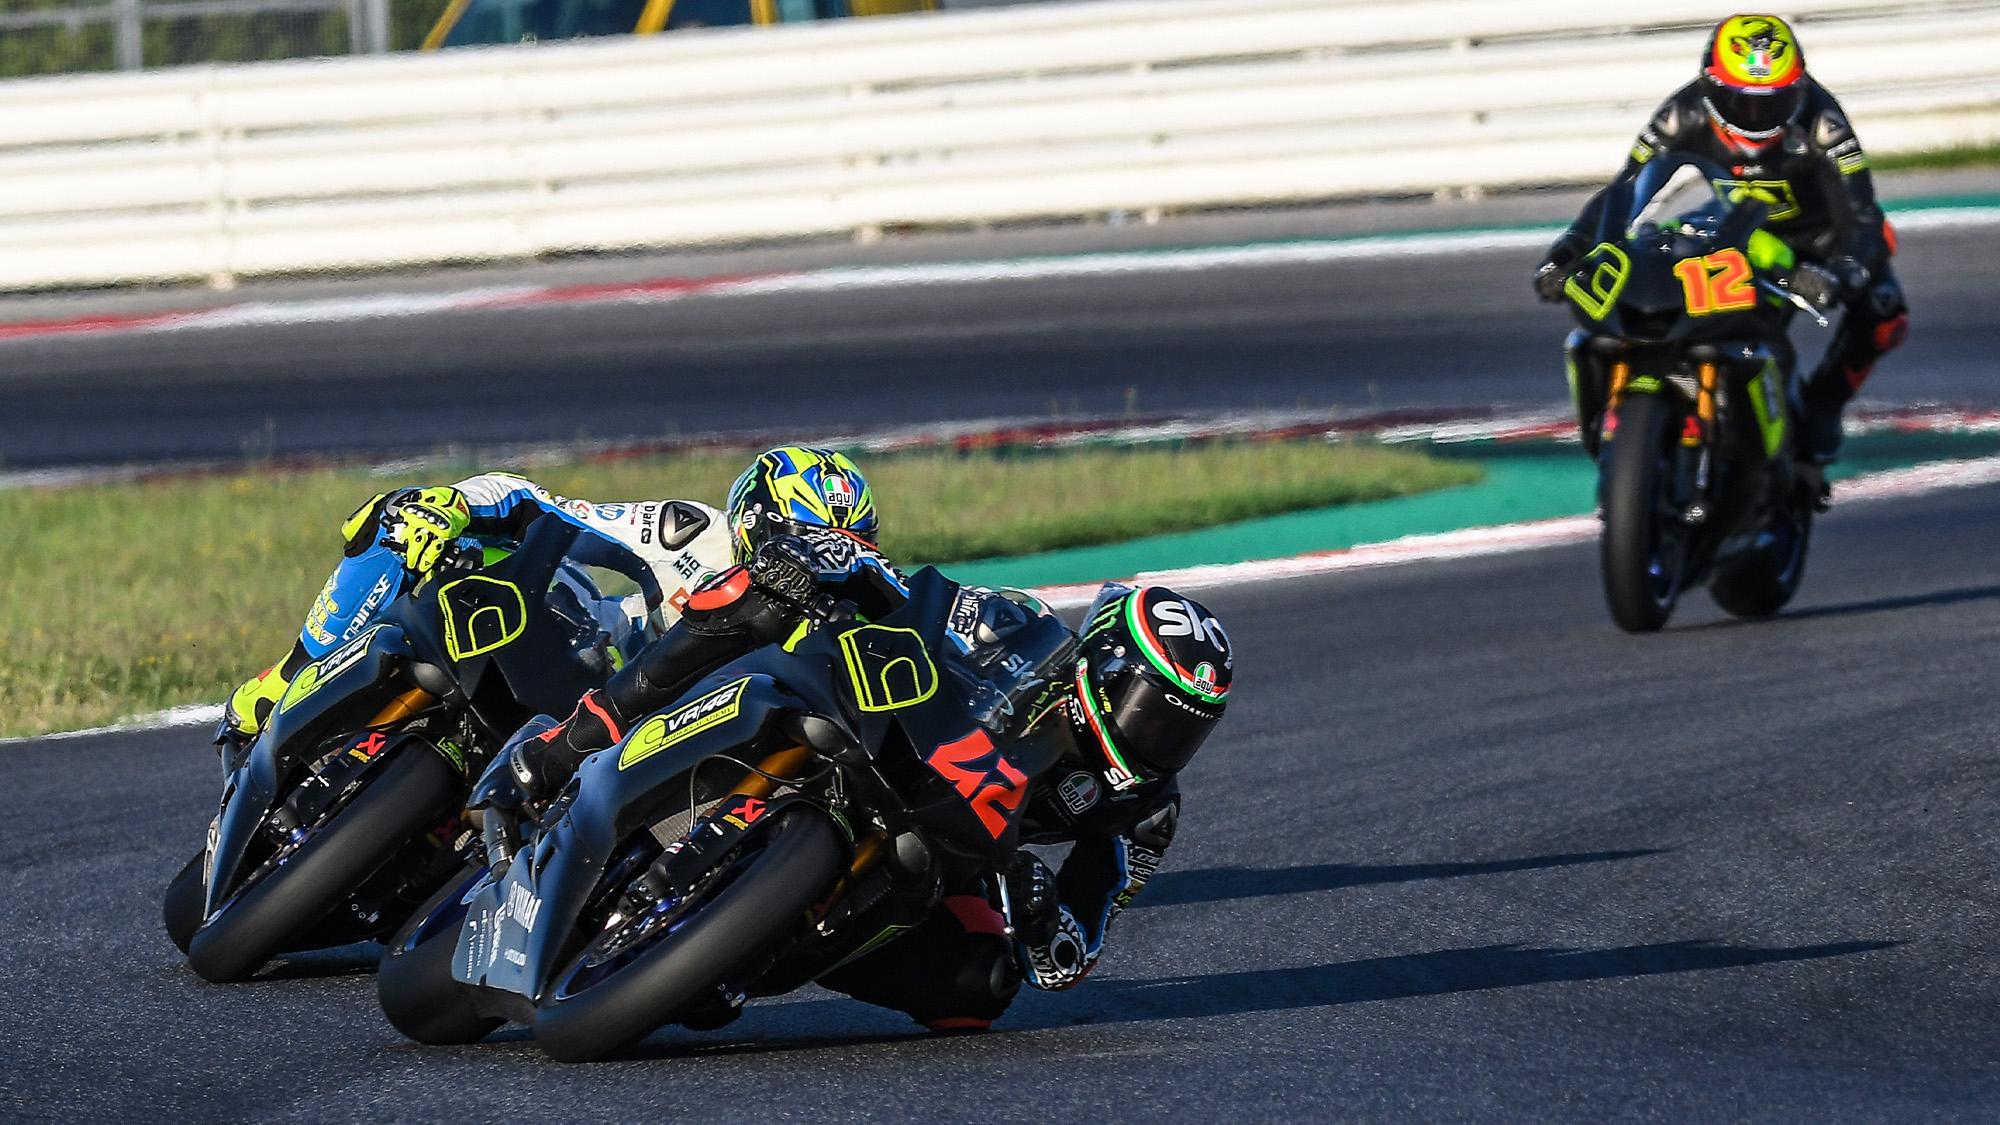 Bagnaia leads Lorenzo Baldassarri and Bezzecchi on VR46 academy bikes